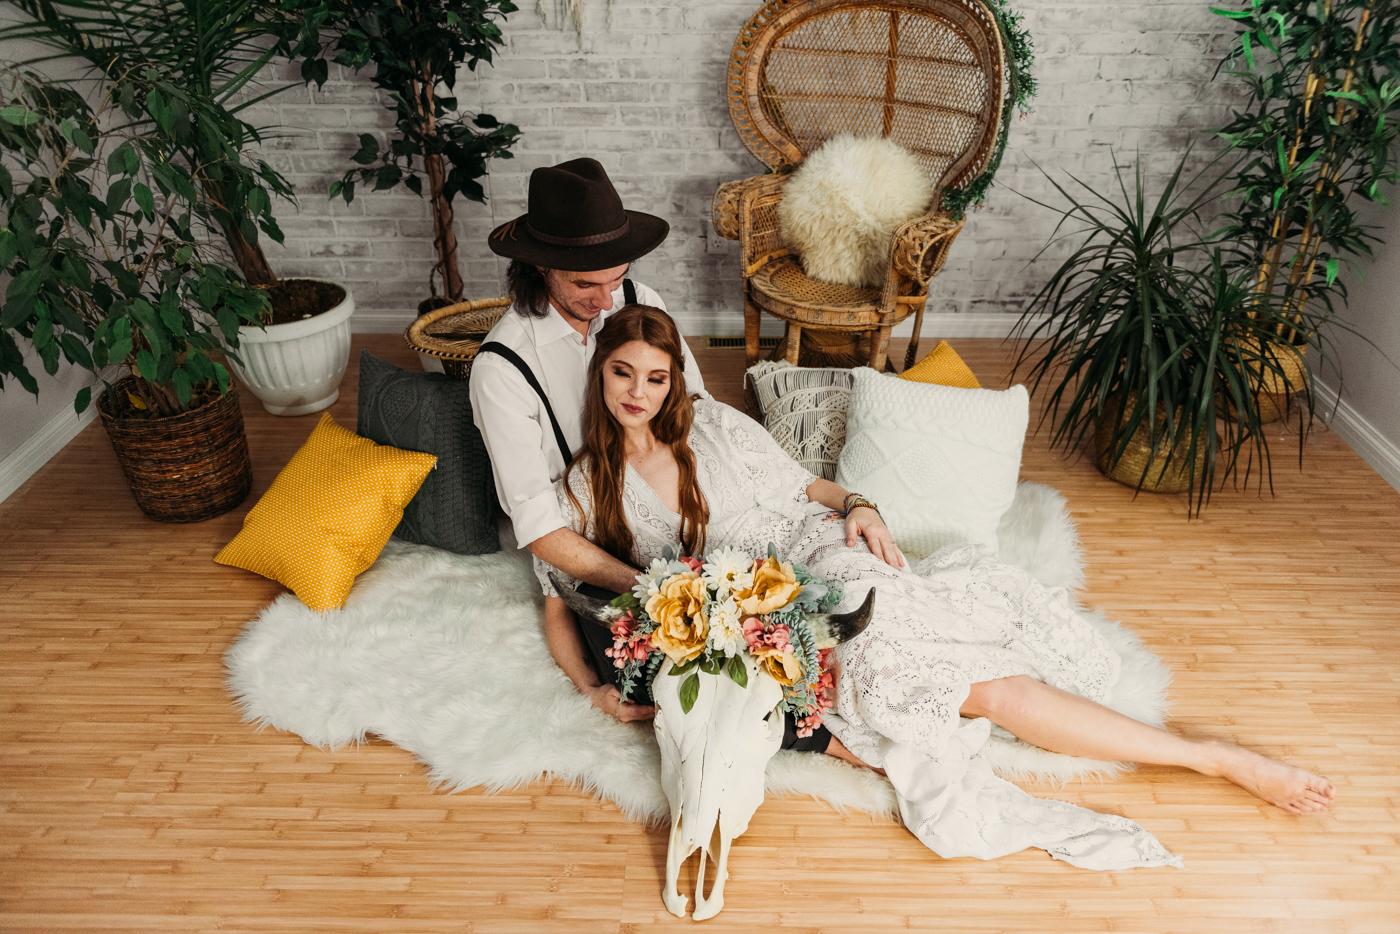 FortSt.John_photographer_TyraEPhotography_Wedding_Couple_Family_Photograhy_DawsonCreek_Elopement_Bride_Boduoir_Portraits-4804.jpg